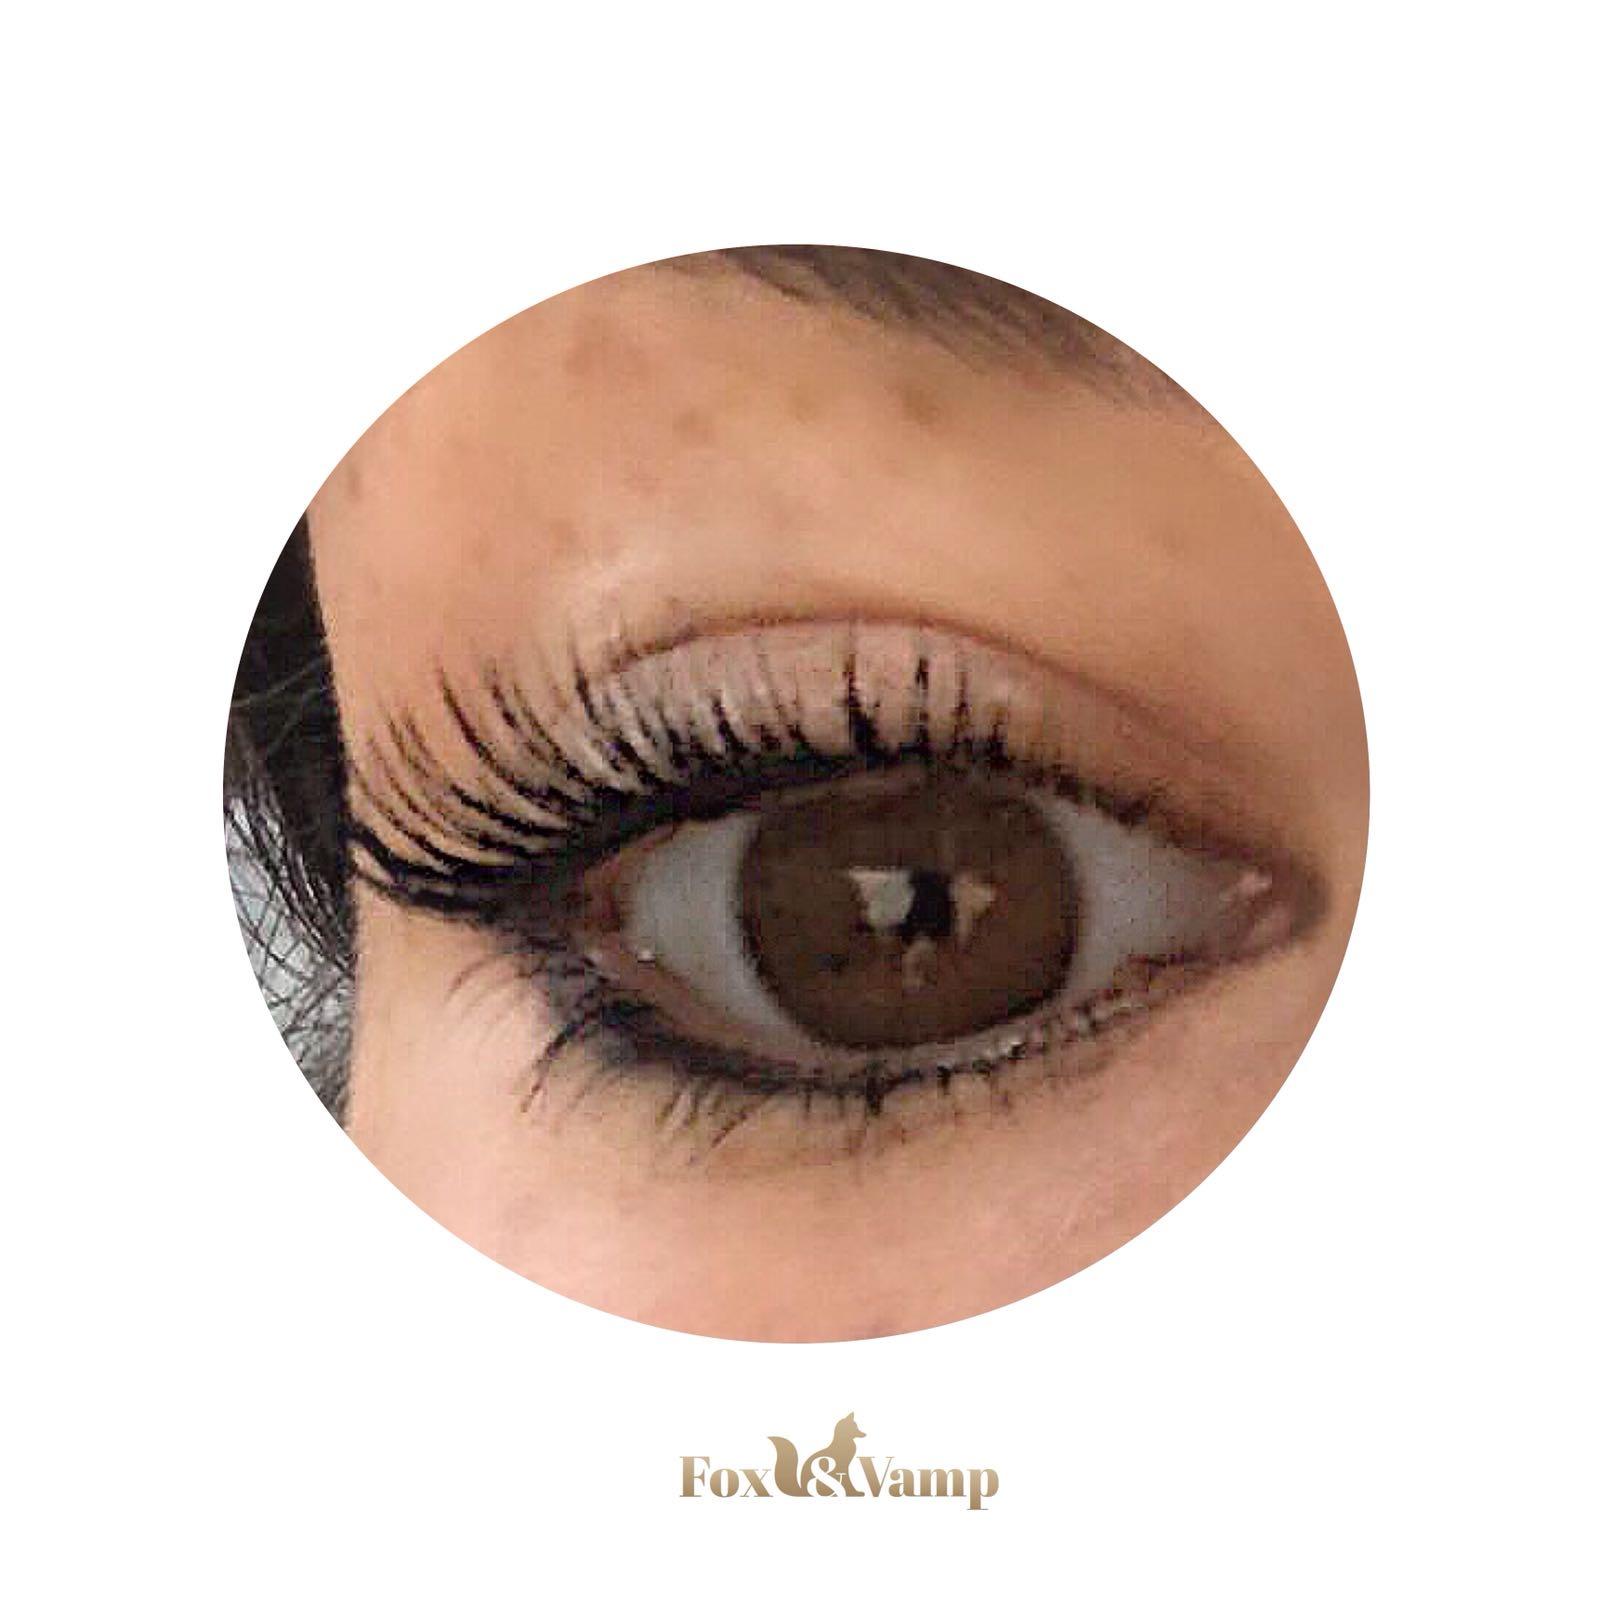 Cat Eyed Volume eyelash extensions